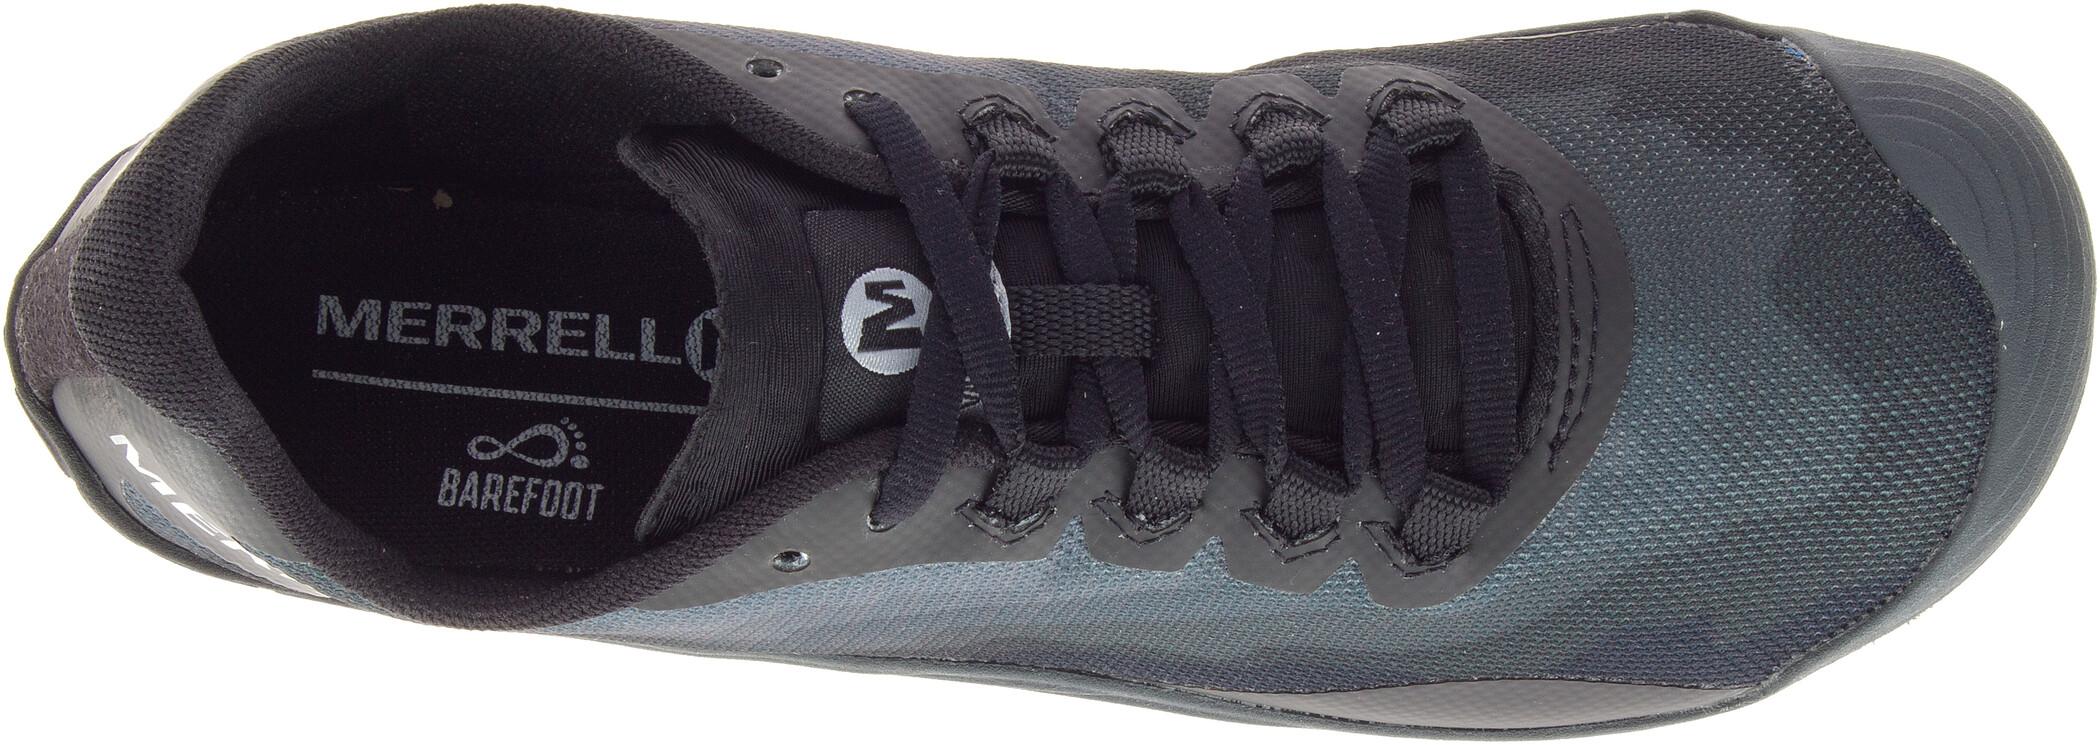 Merrell Vapor Glove 4 Shoes Dam black